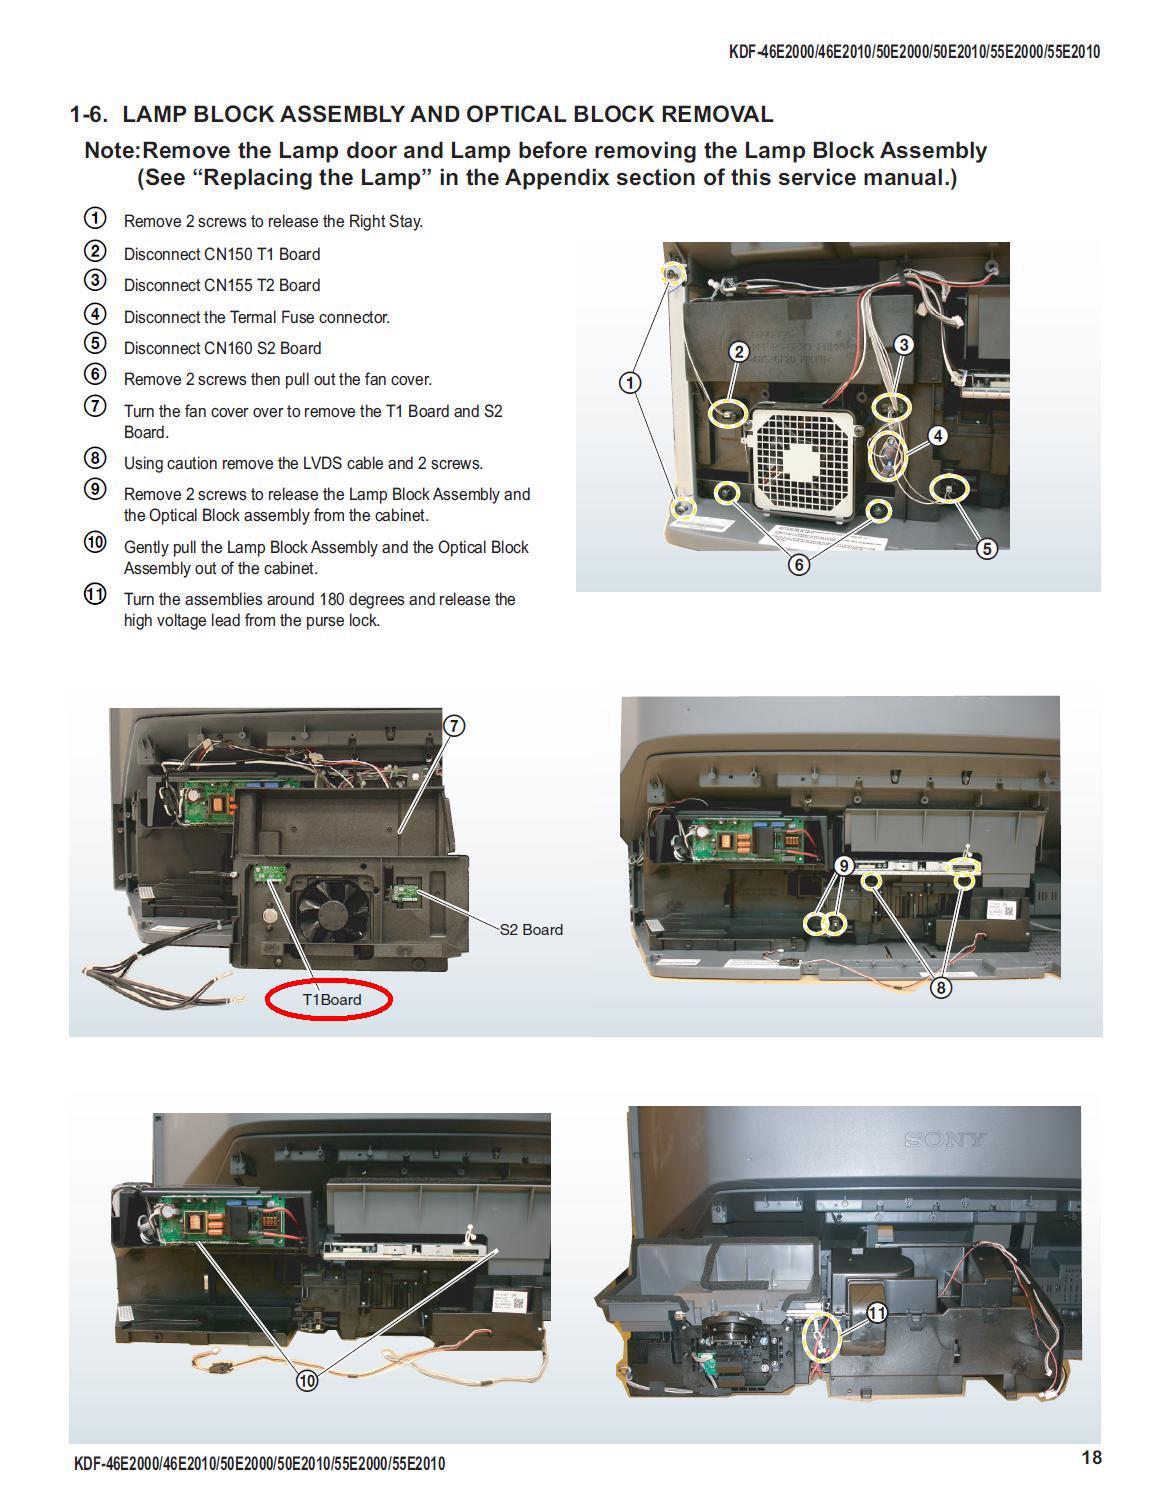 I Have A Sony Grand Wega 46 Quot Lcd Projection Tv Bulb